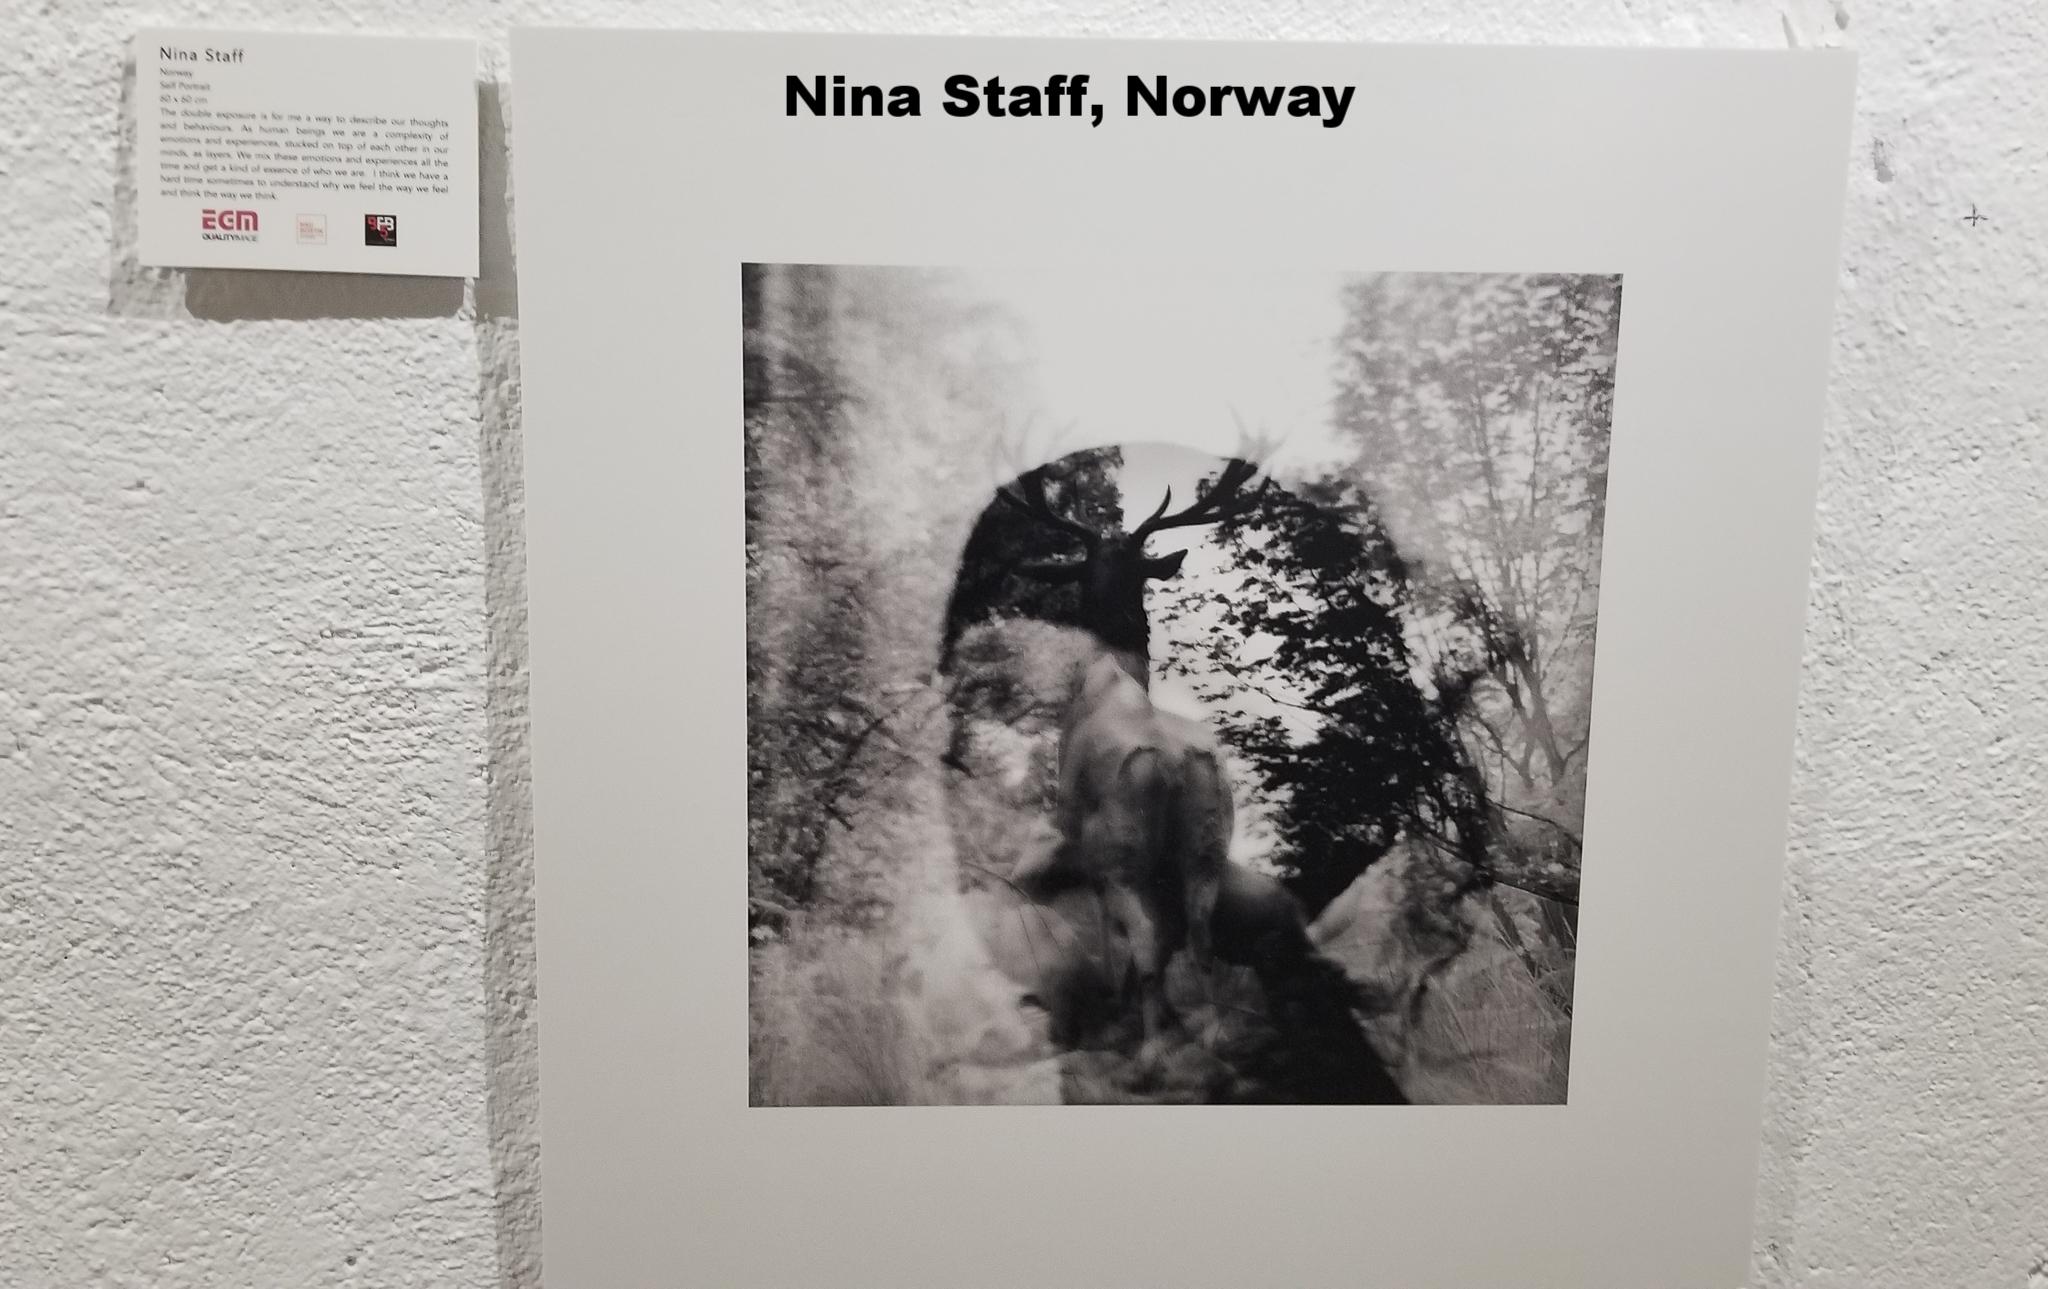 Nina Staff, Norway